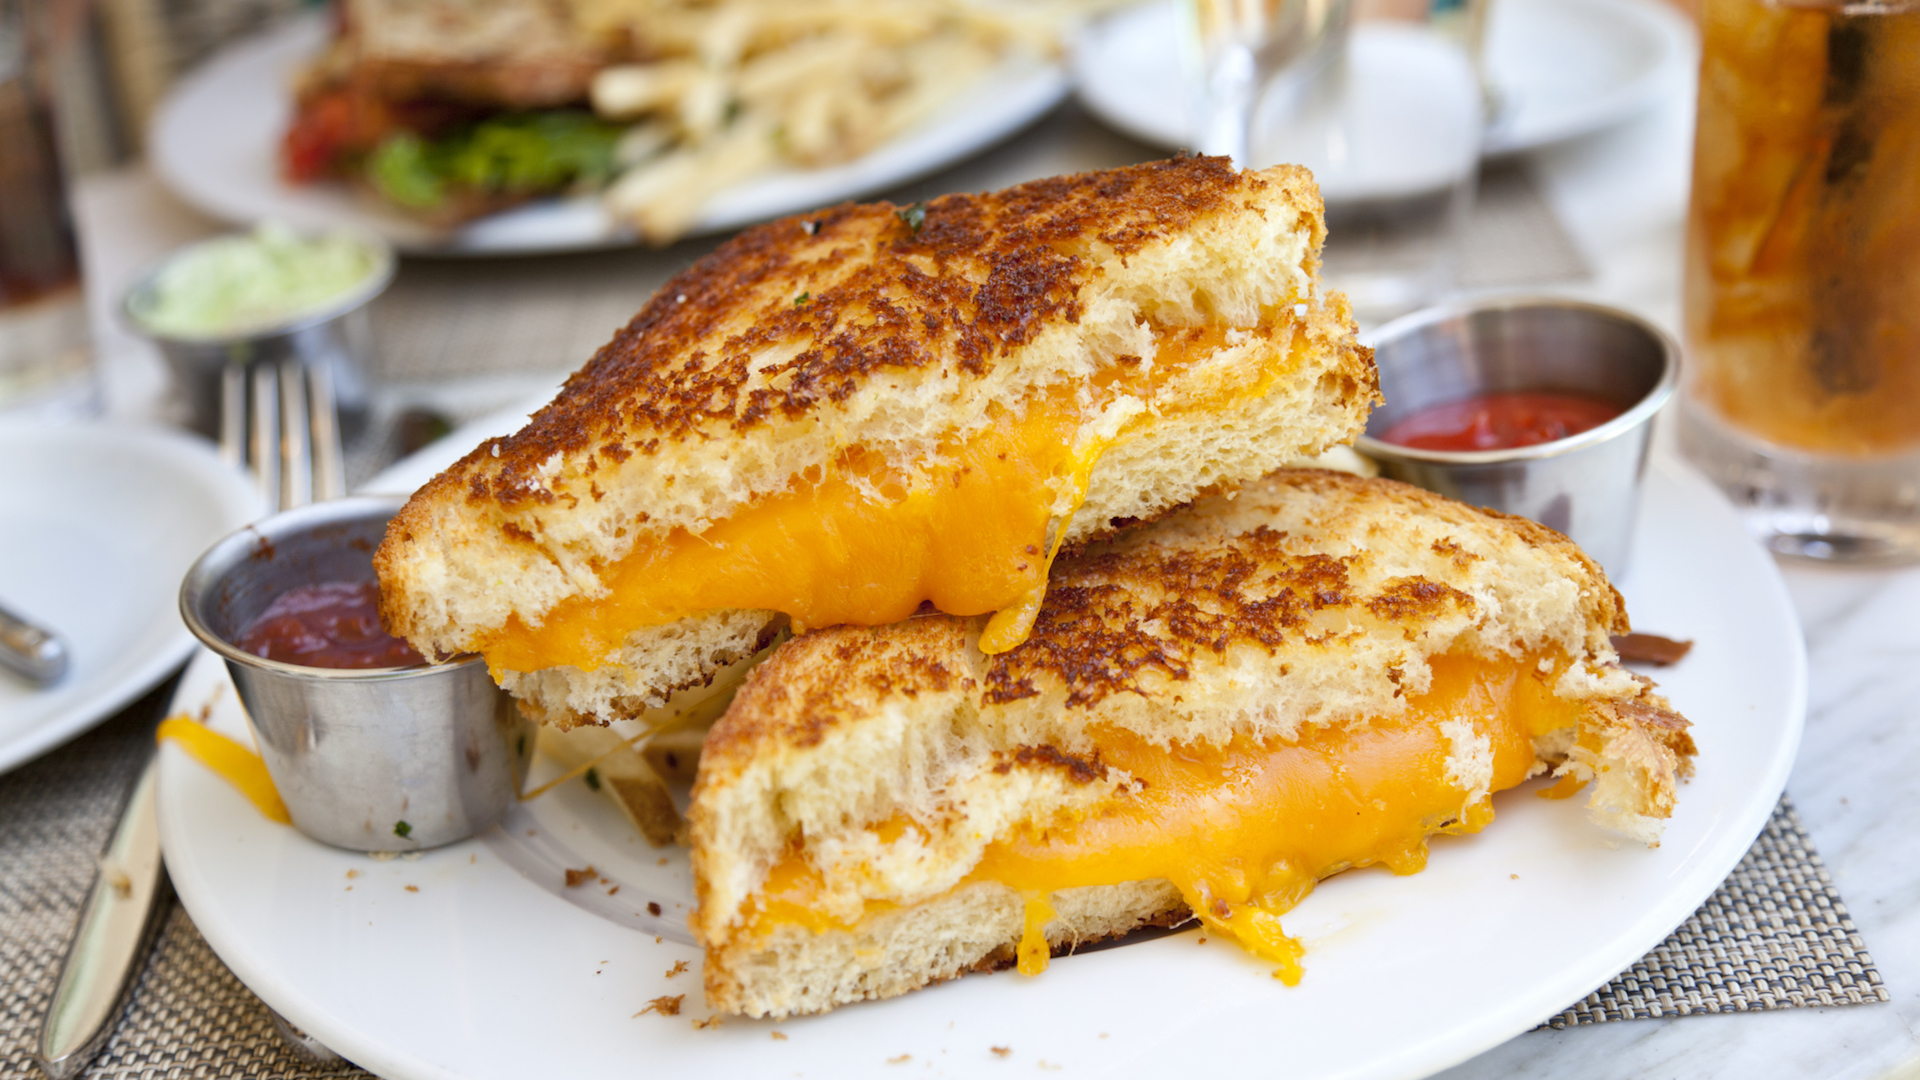 grilled cheese hd desktop wallpaper 137